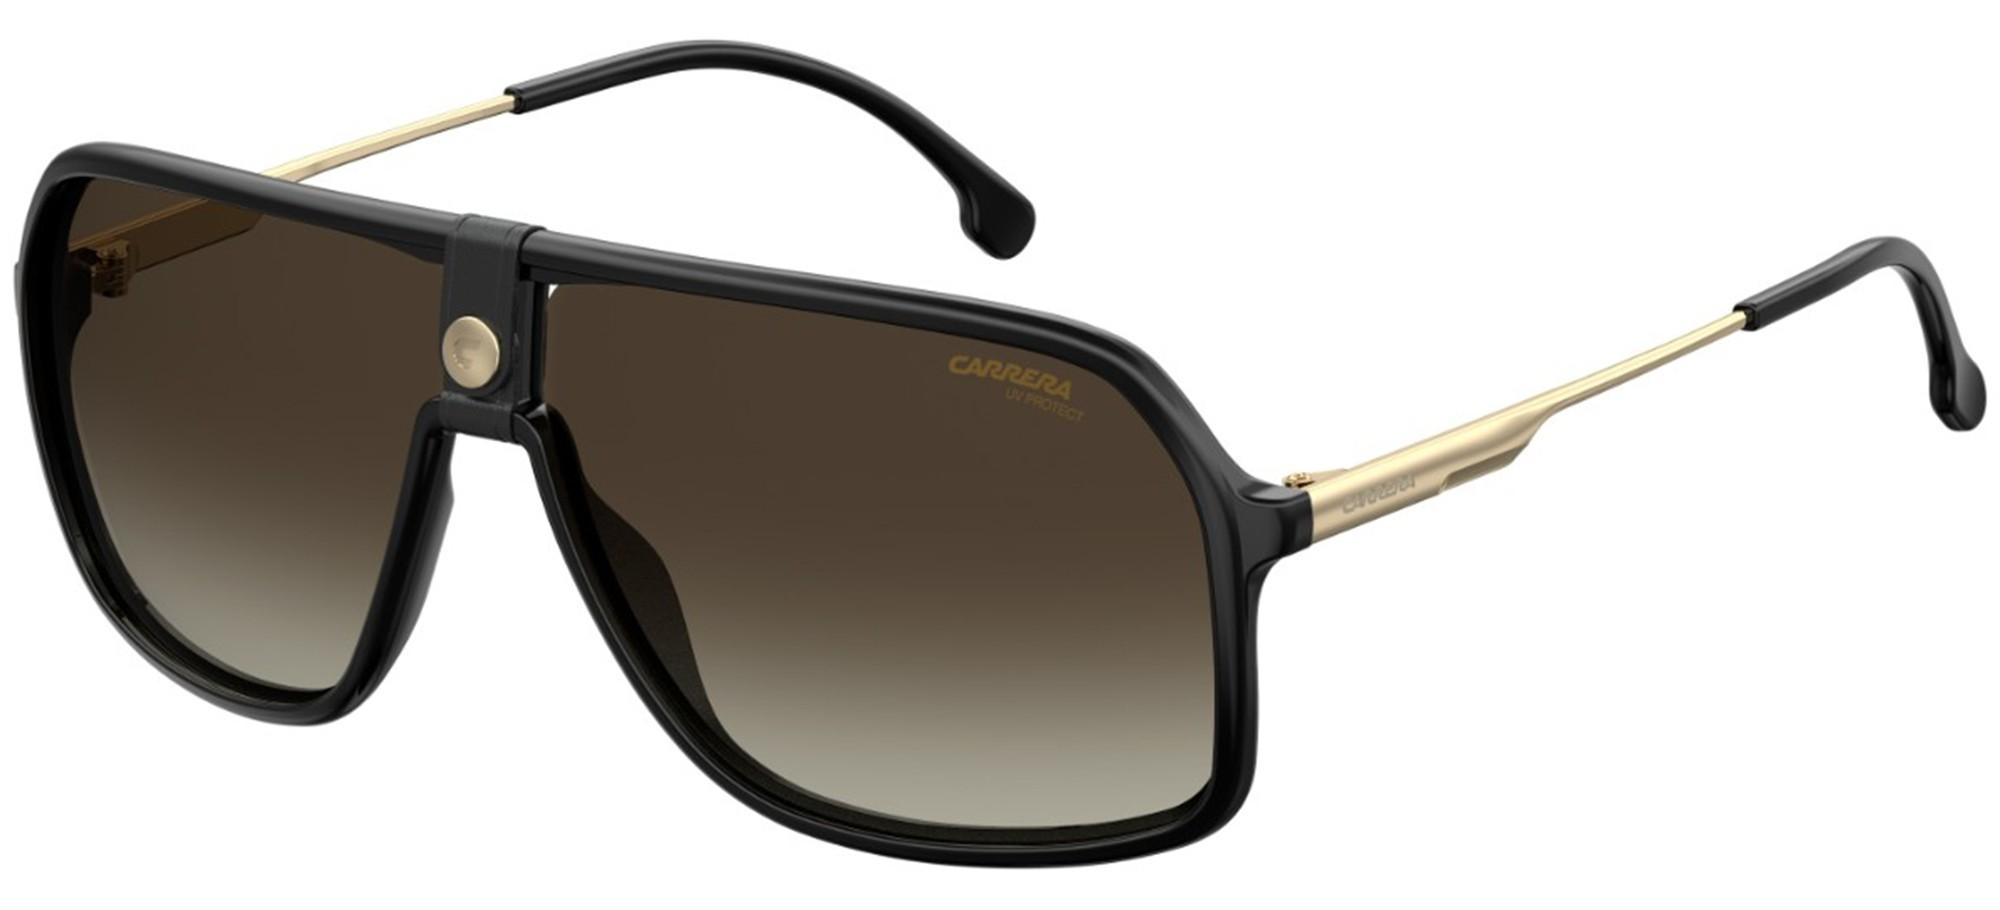 Carrera sunglasses CARRERA 1019/S